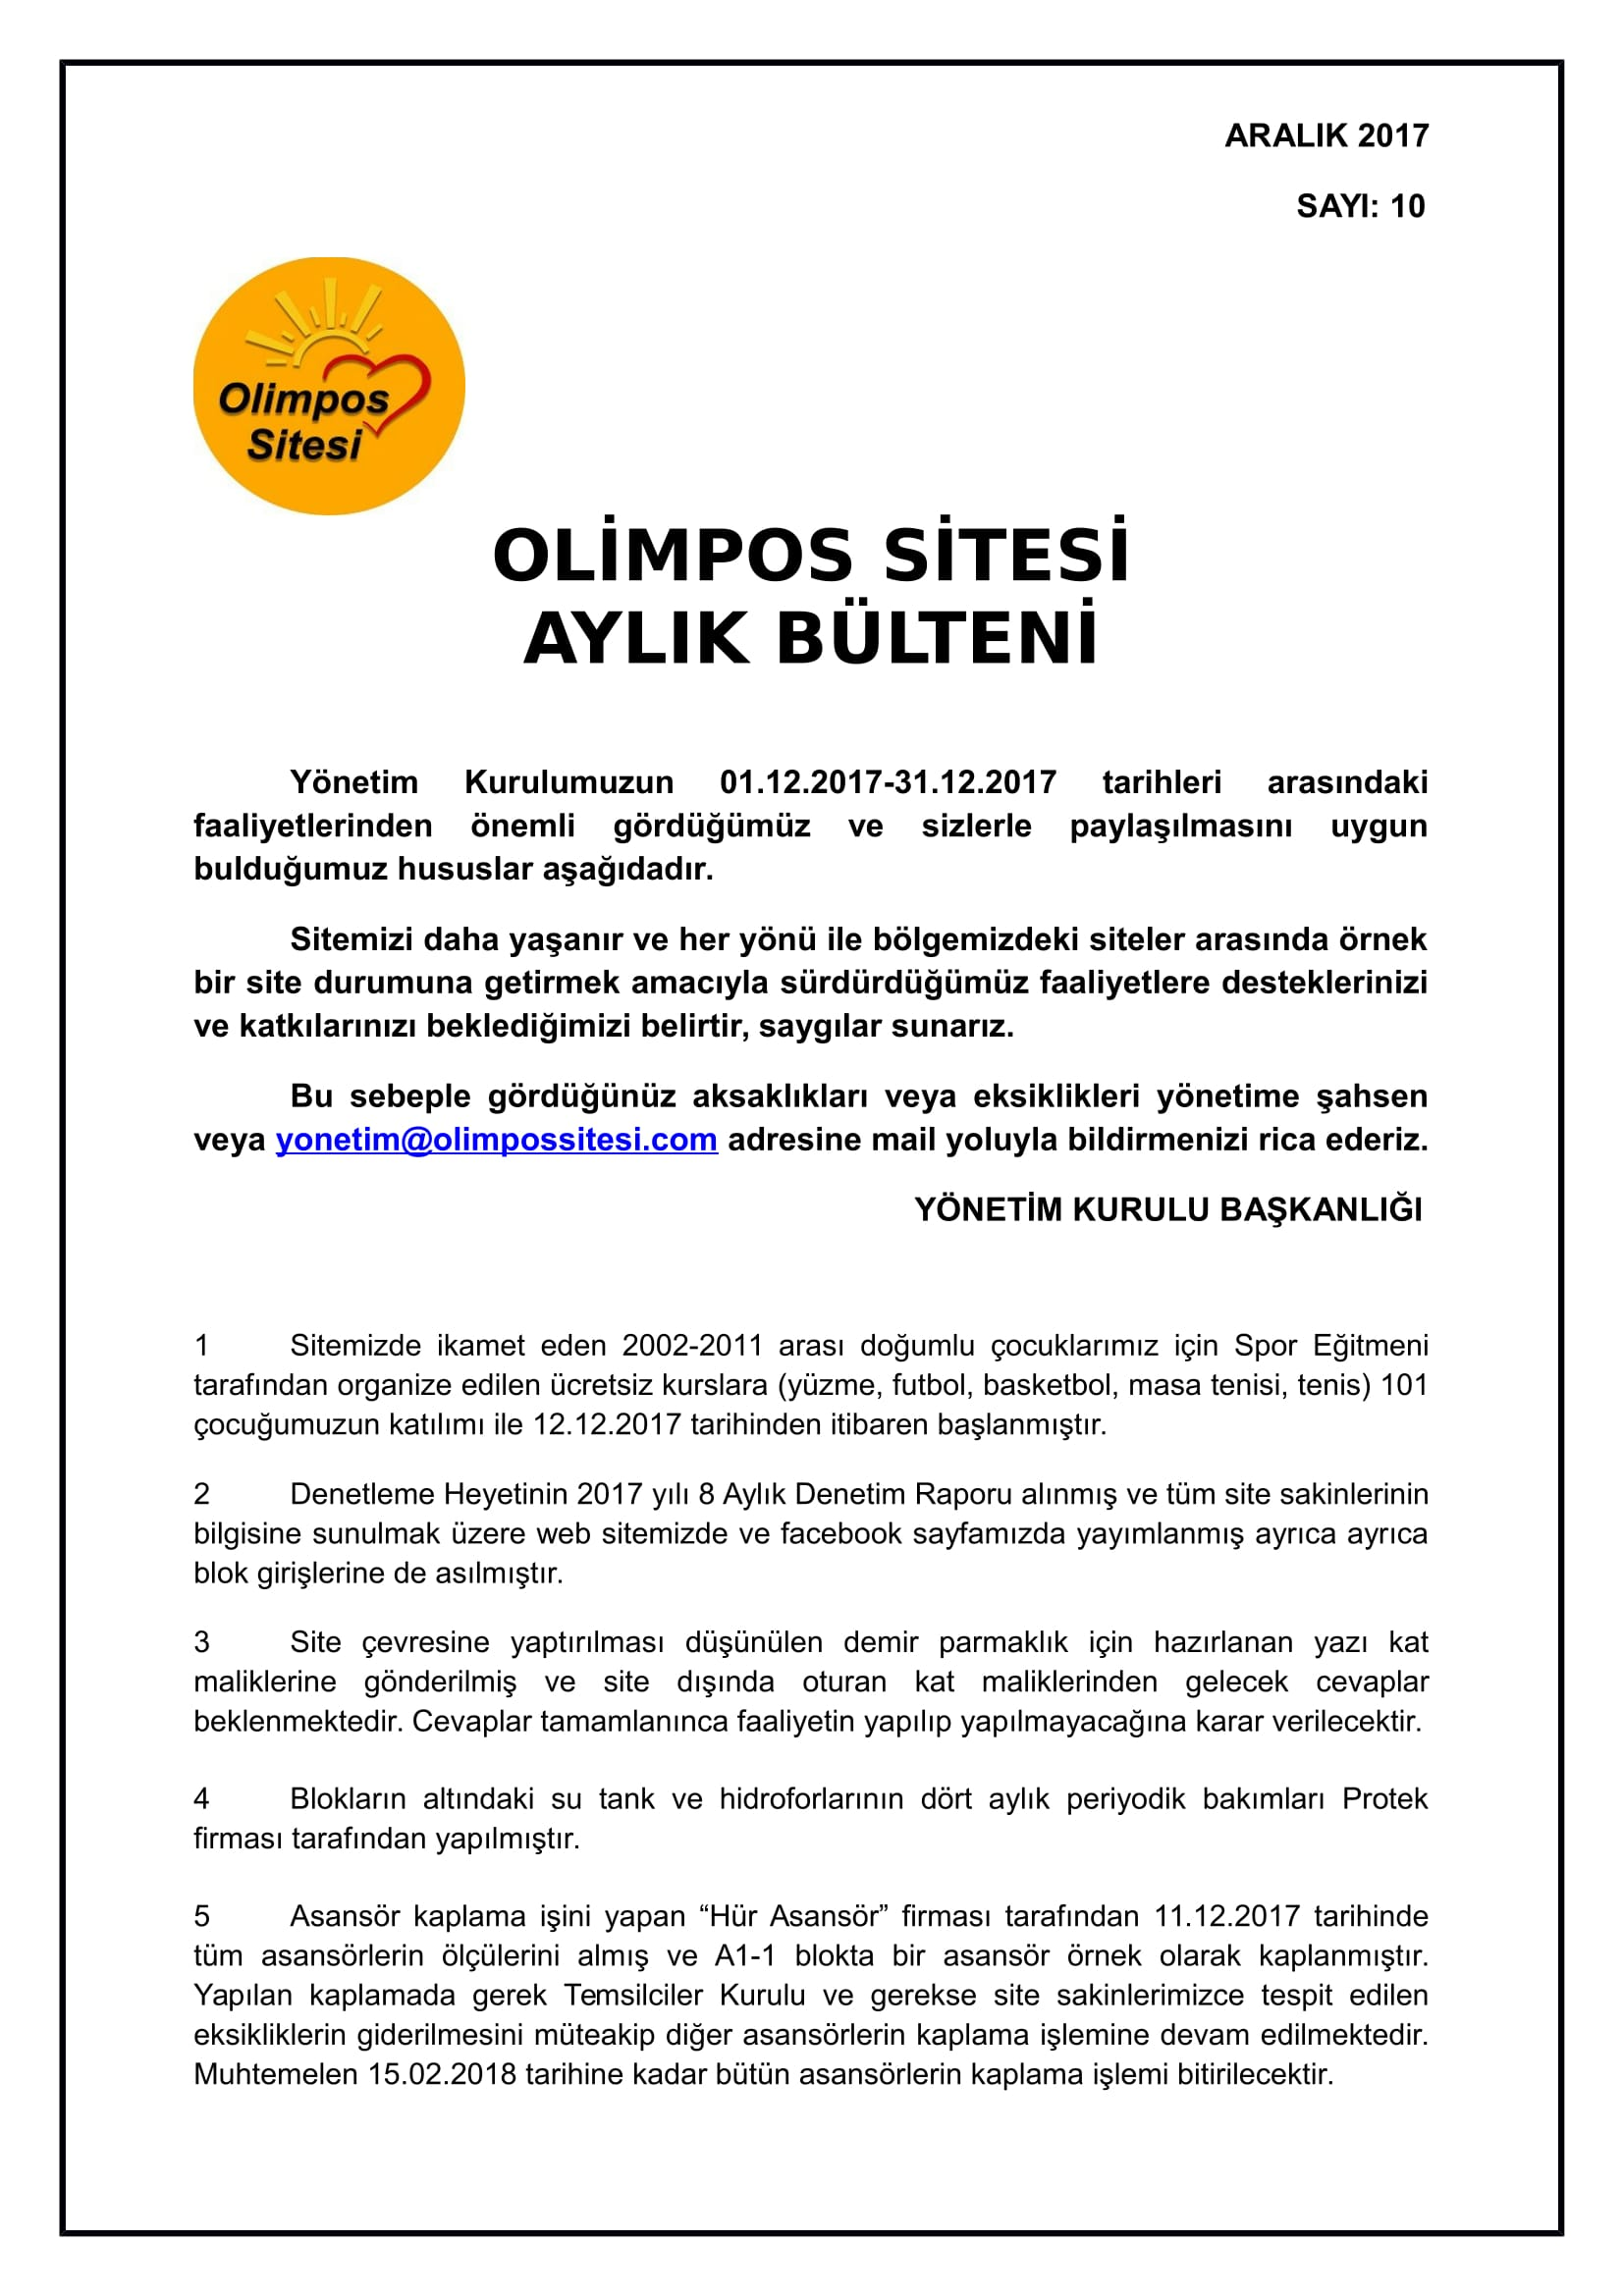 10-01 12 2017 ARALIK-2017 BÜLTEN-1